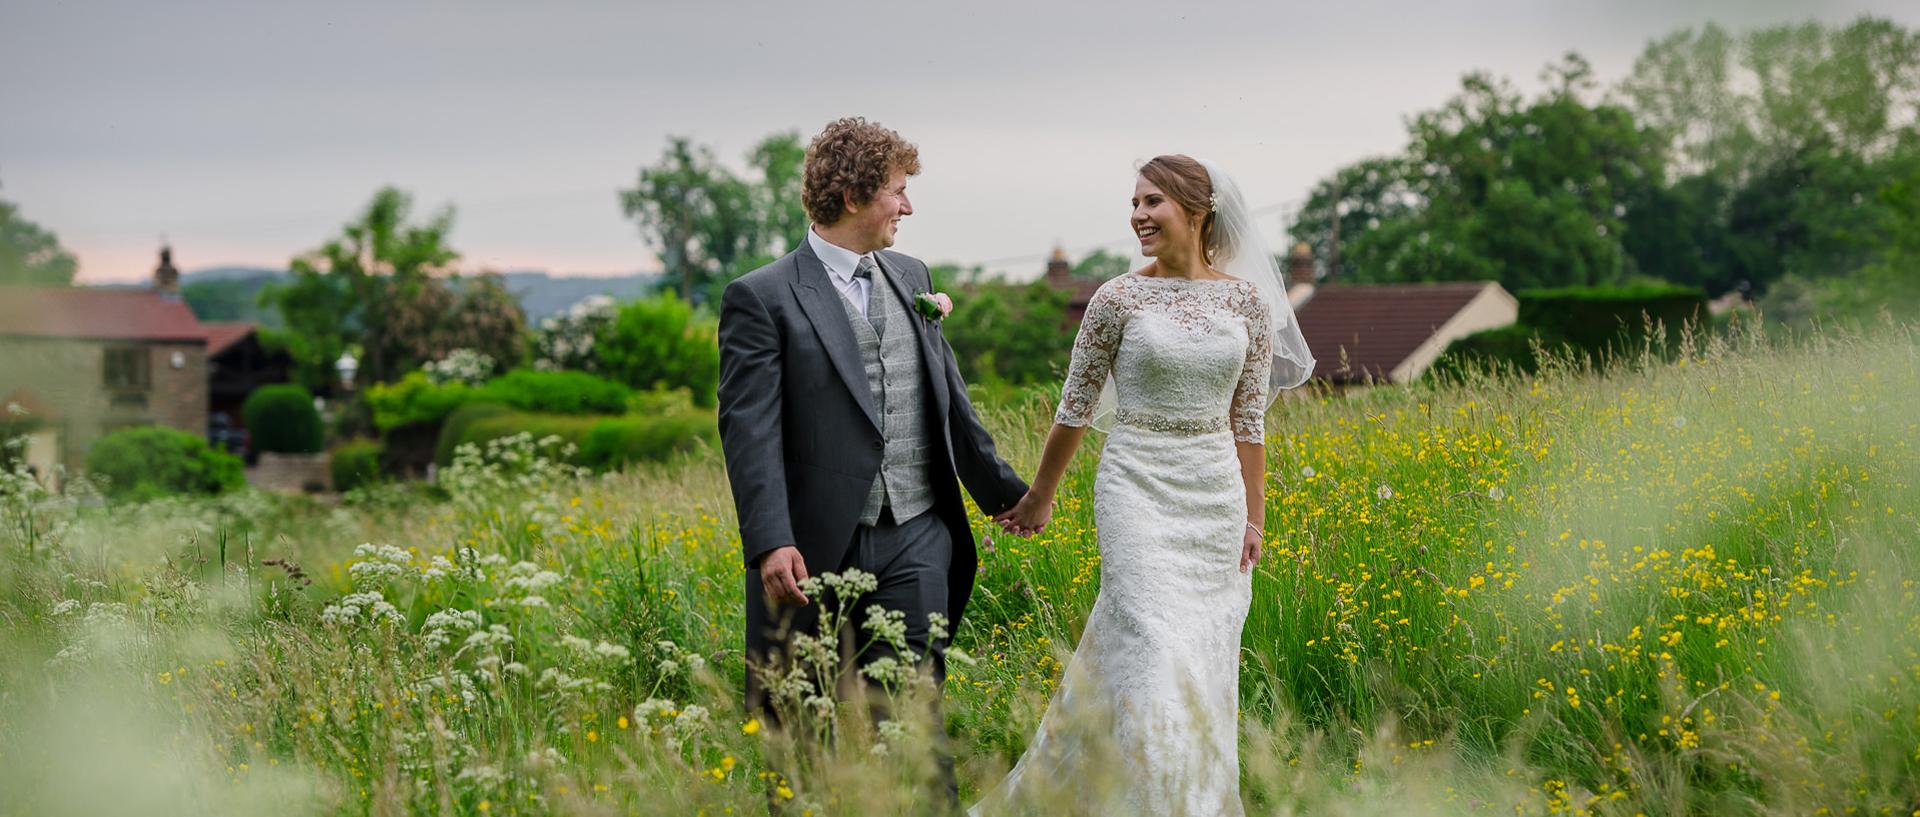 Becky & Harry - Headlam Hall Wedding Photography